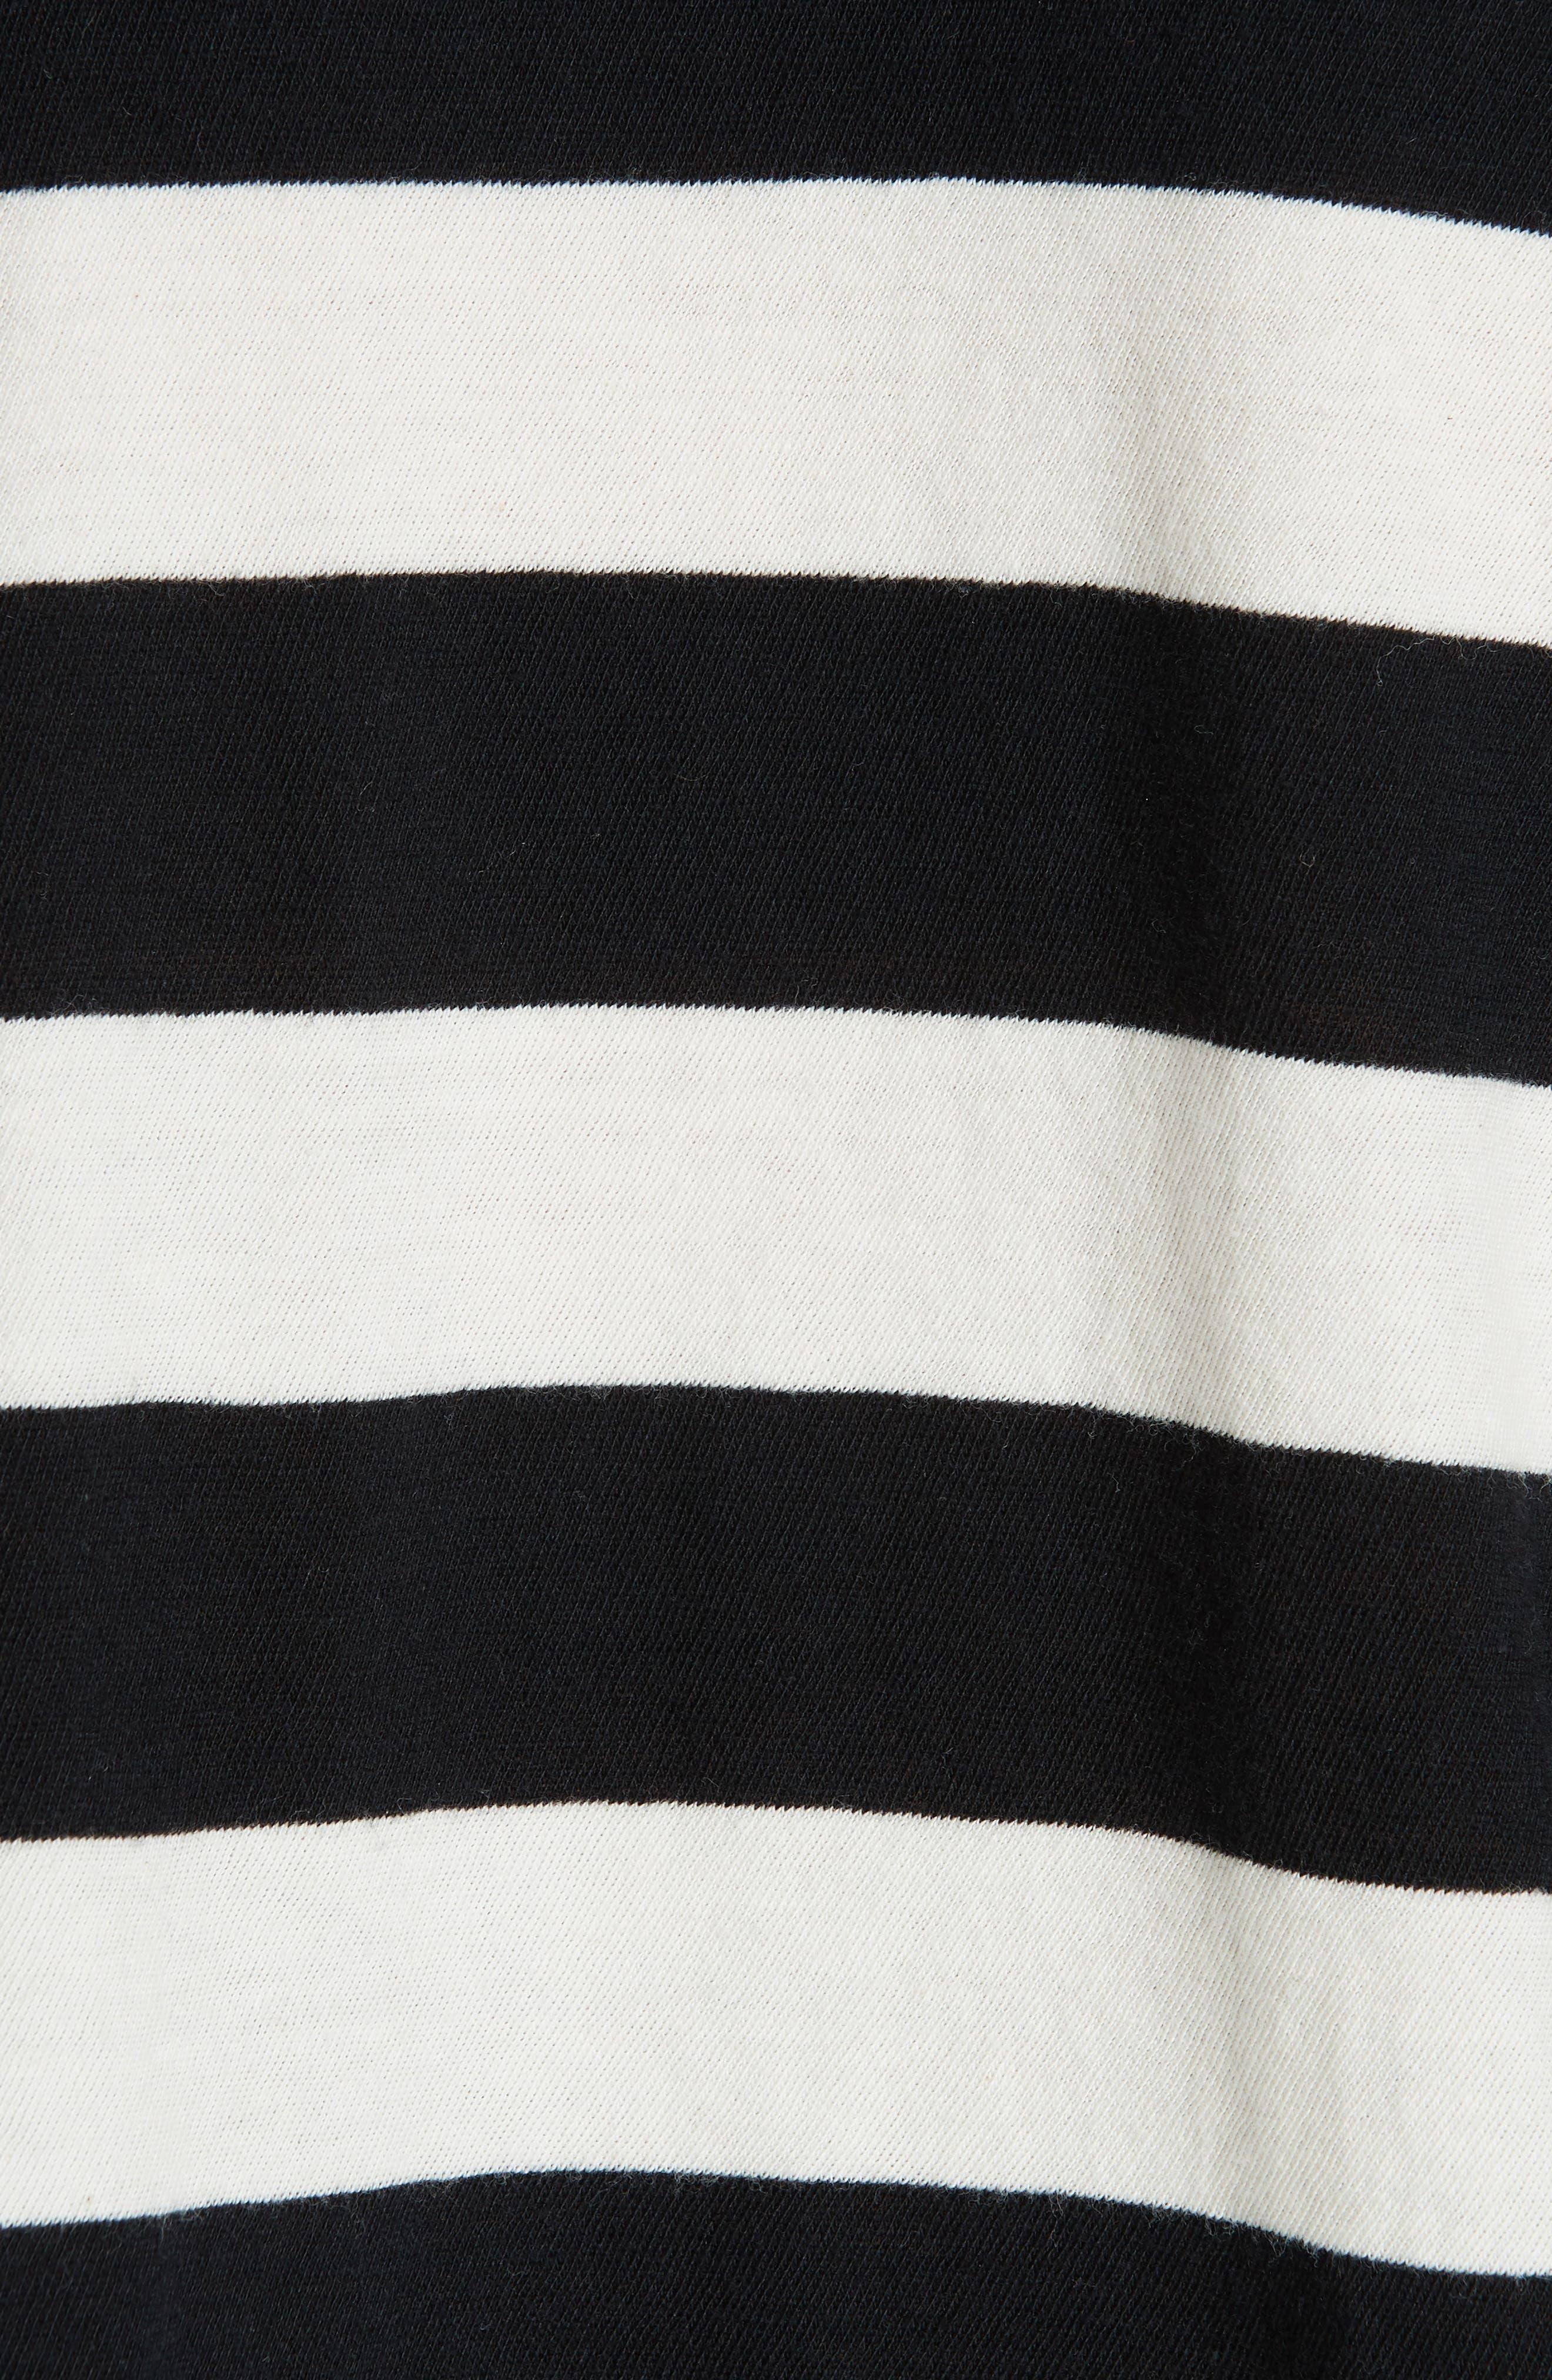 Stripe Crop Tee,                             Alternate thumbnail 5, color,                             BLACK MIXED STRIPE